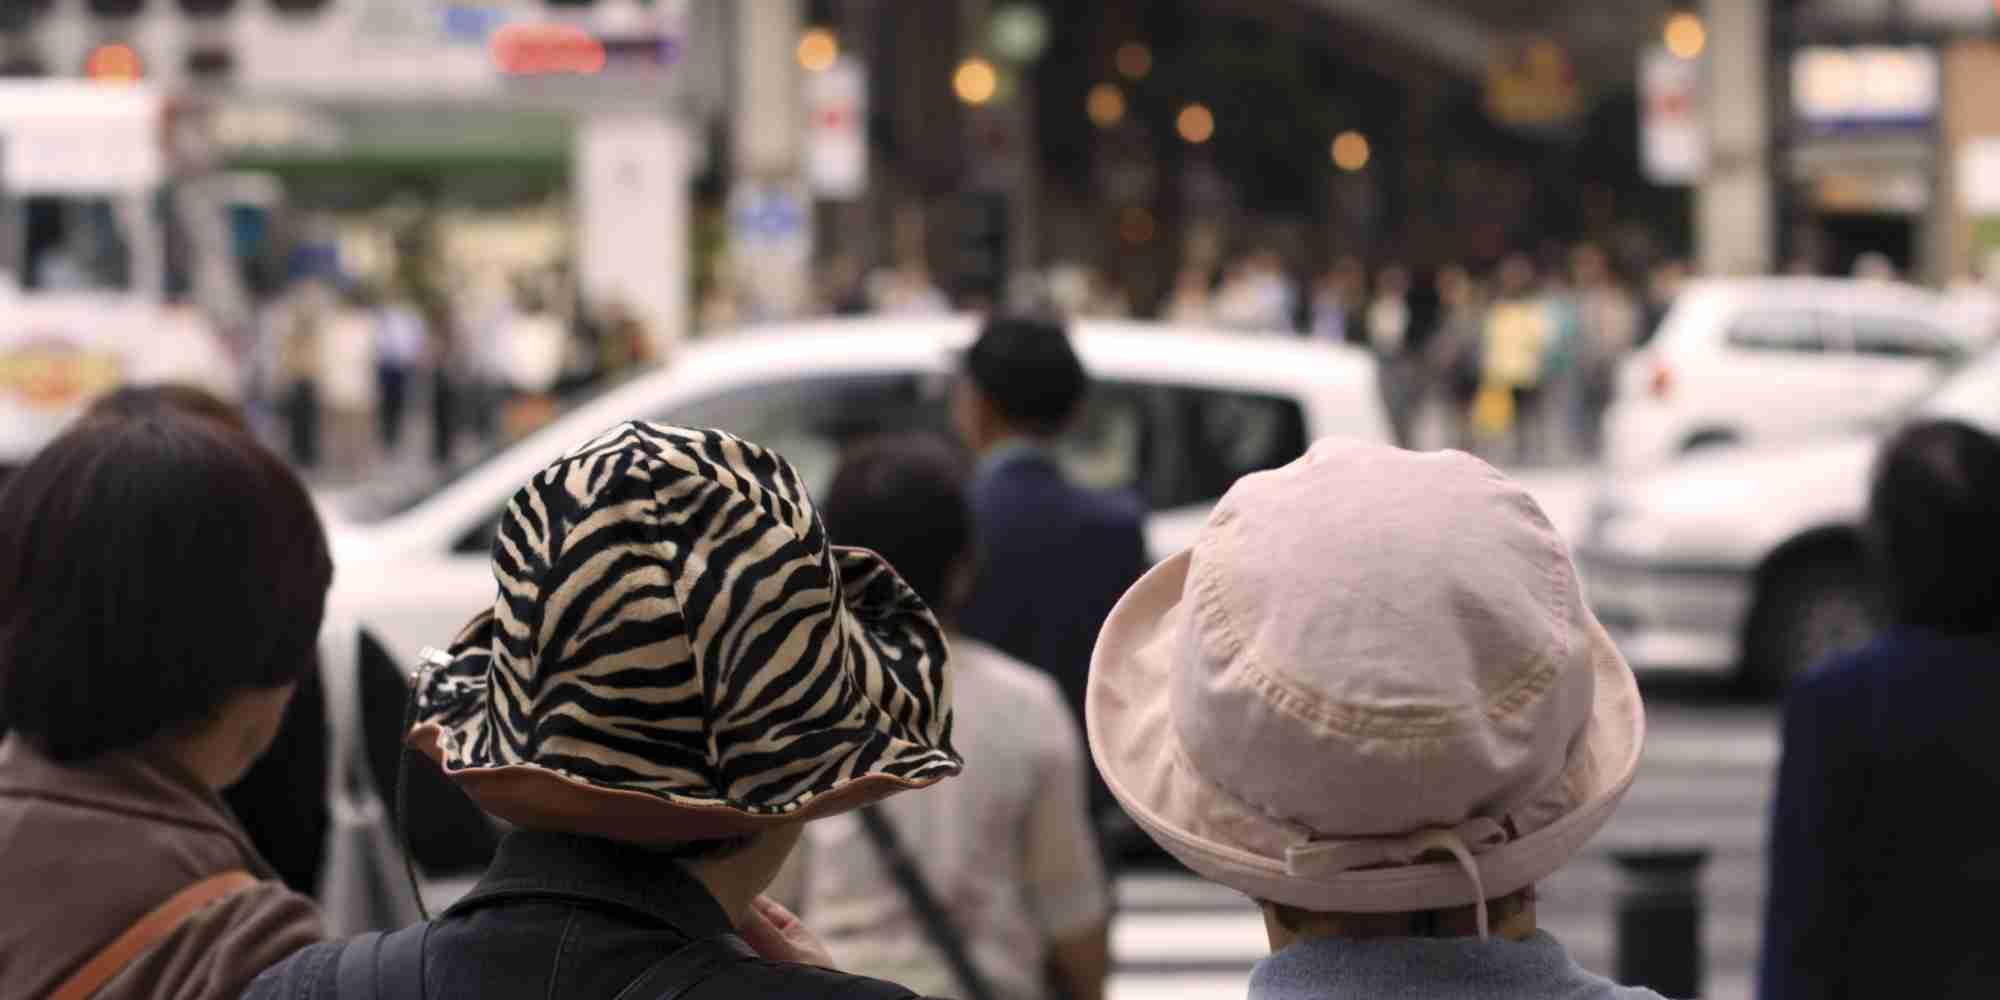 生活保護法「永住外国人は対象外」 中国人女性の逆転敗訴が確定